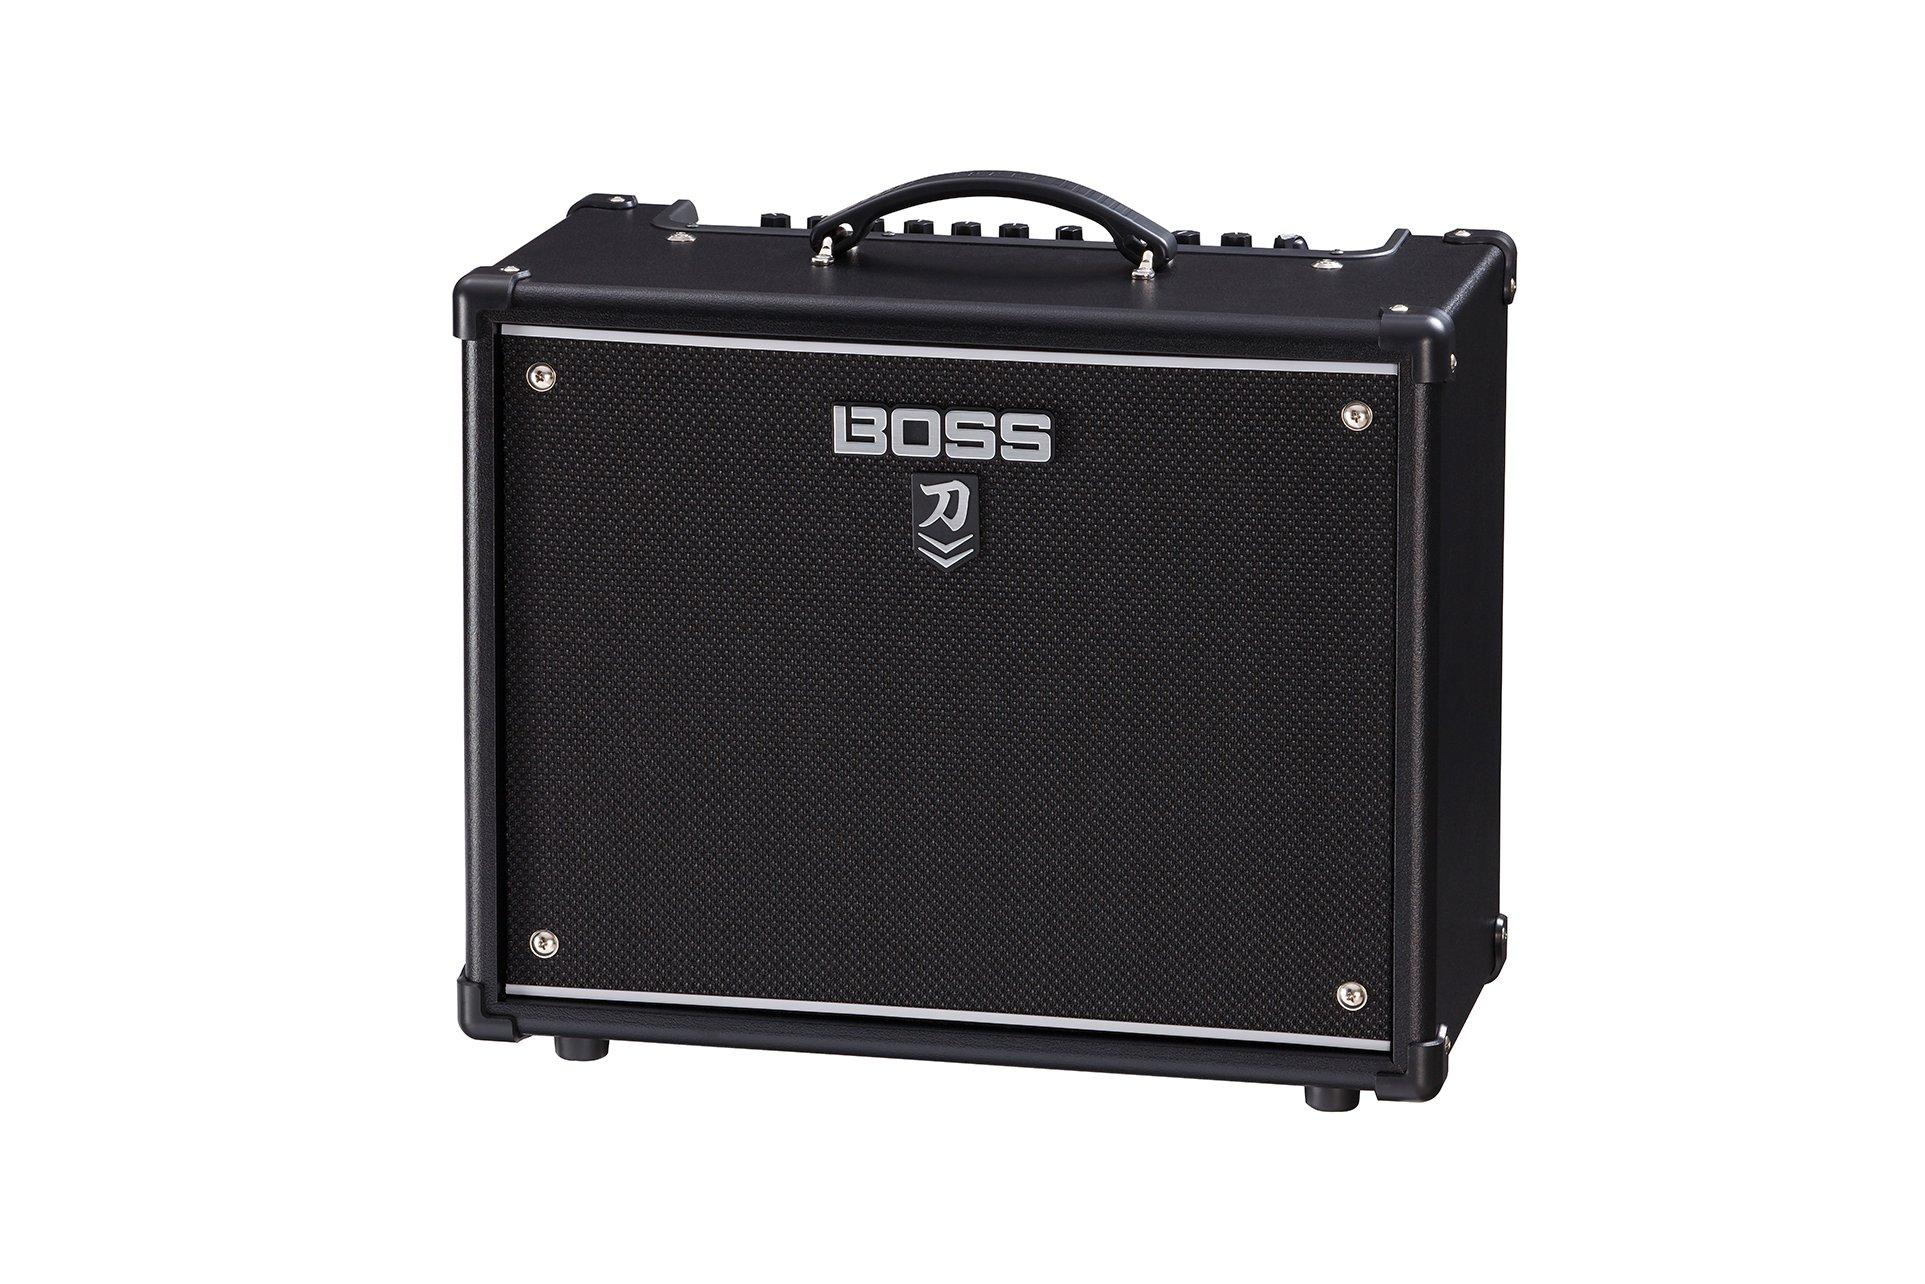 Boss KTN-50 MKII V2 50W 1x12 Guitar Combo Amplifier - Black